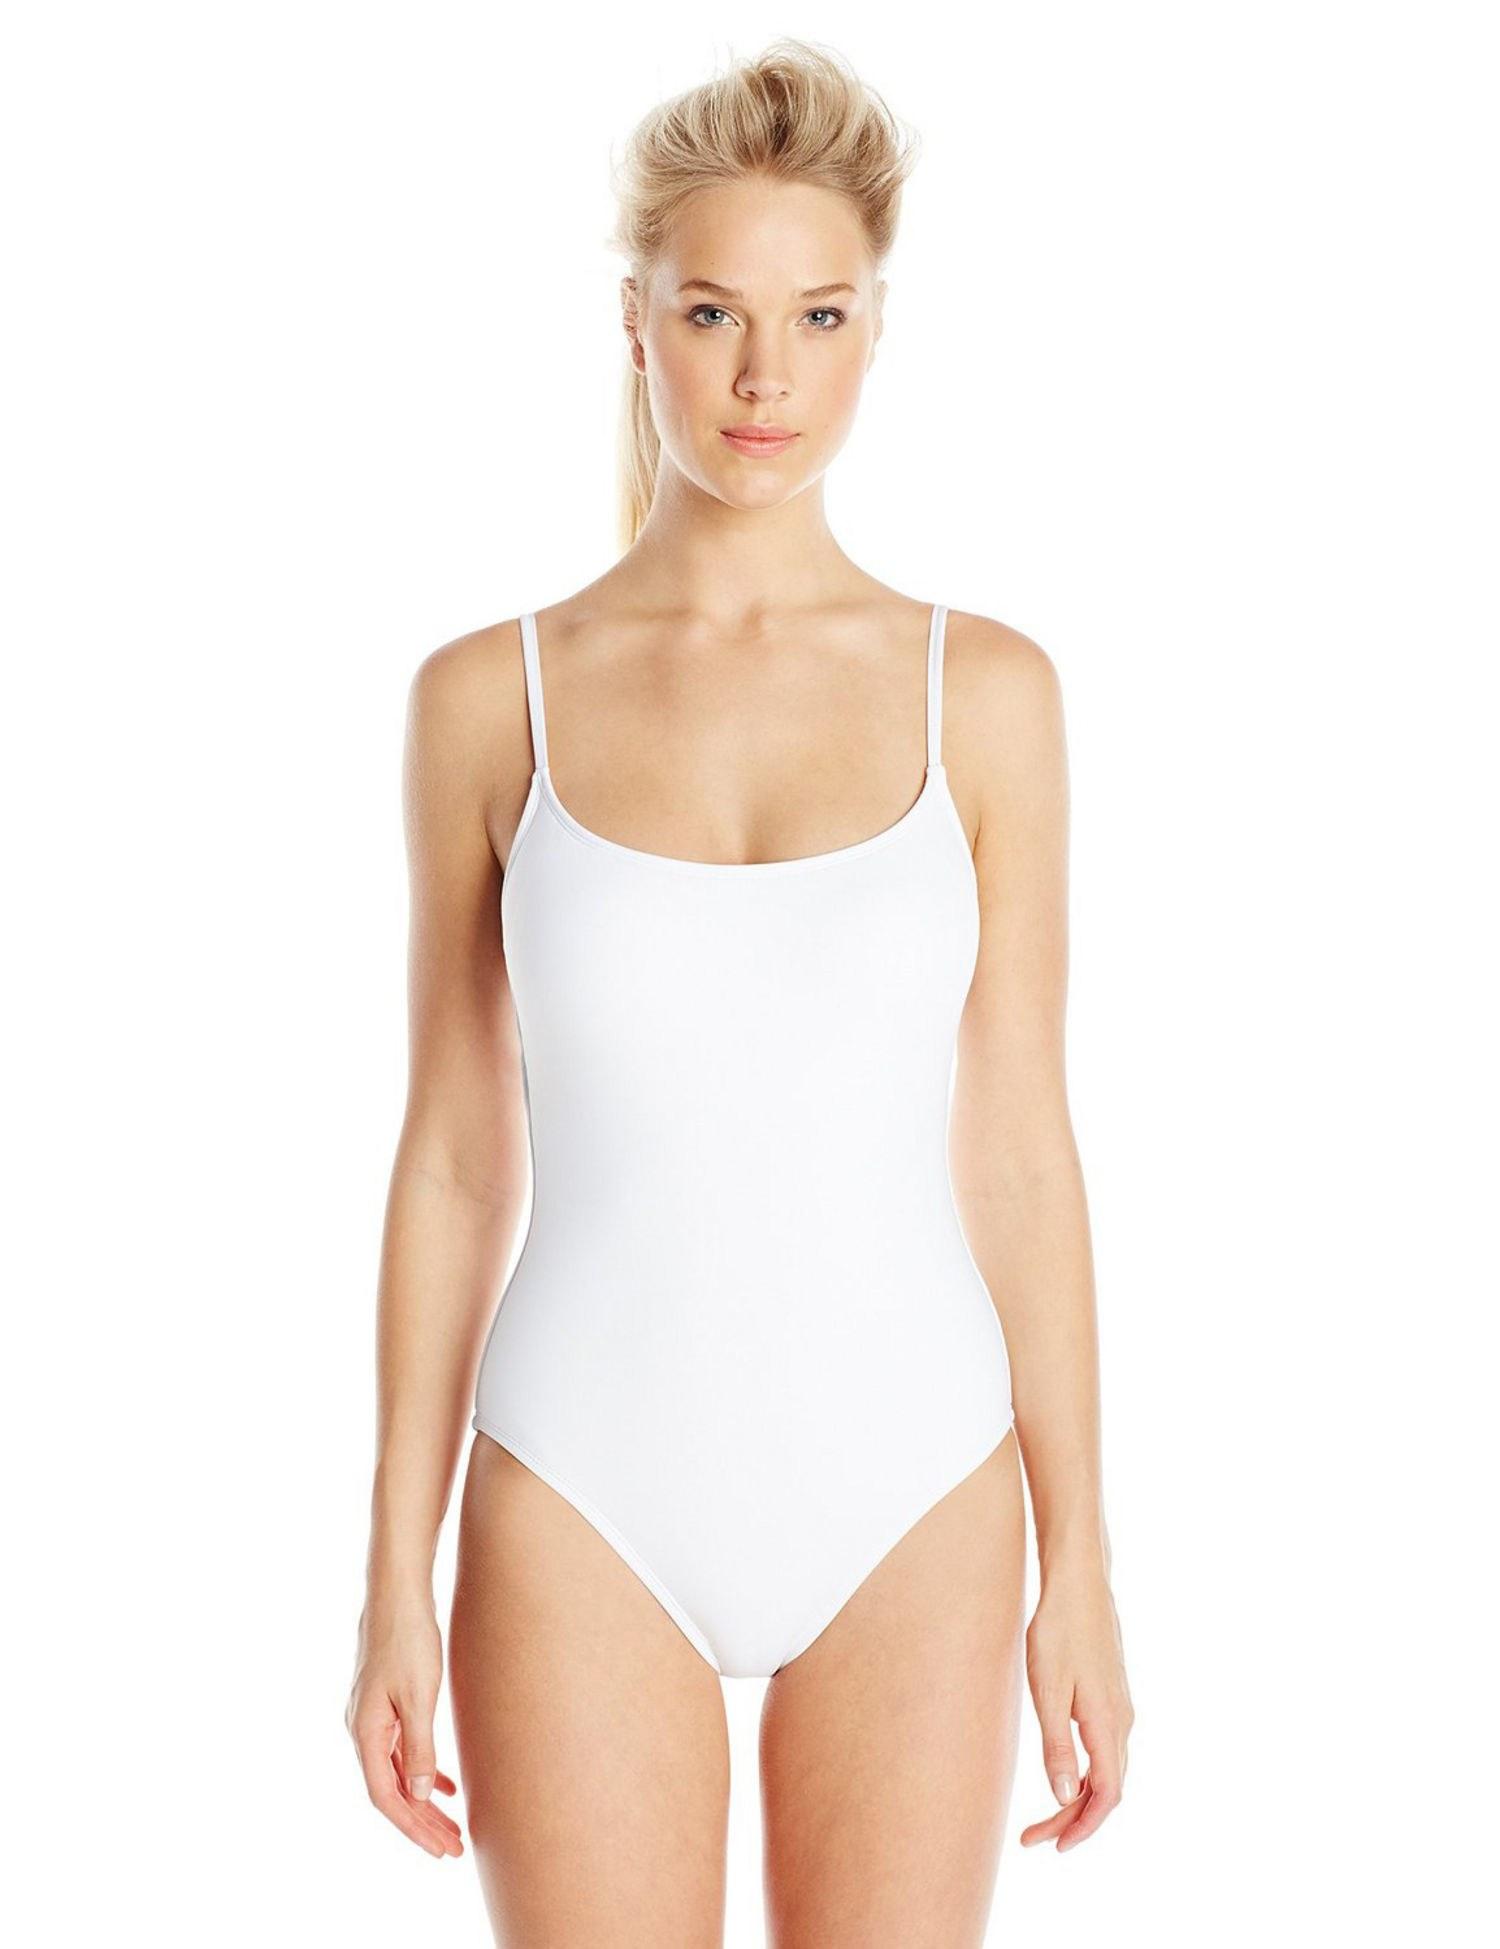 white swimsuit 10 white swimsuits that arenu0027t see-through when wet | glamour qtsekoa